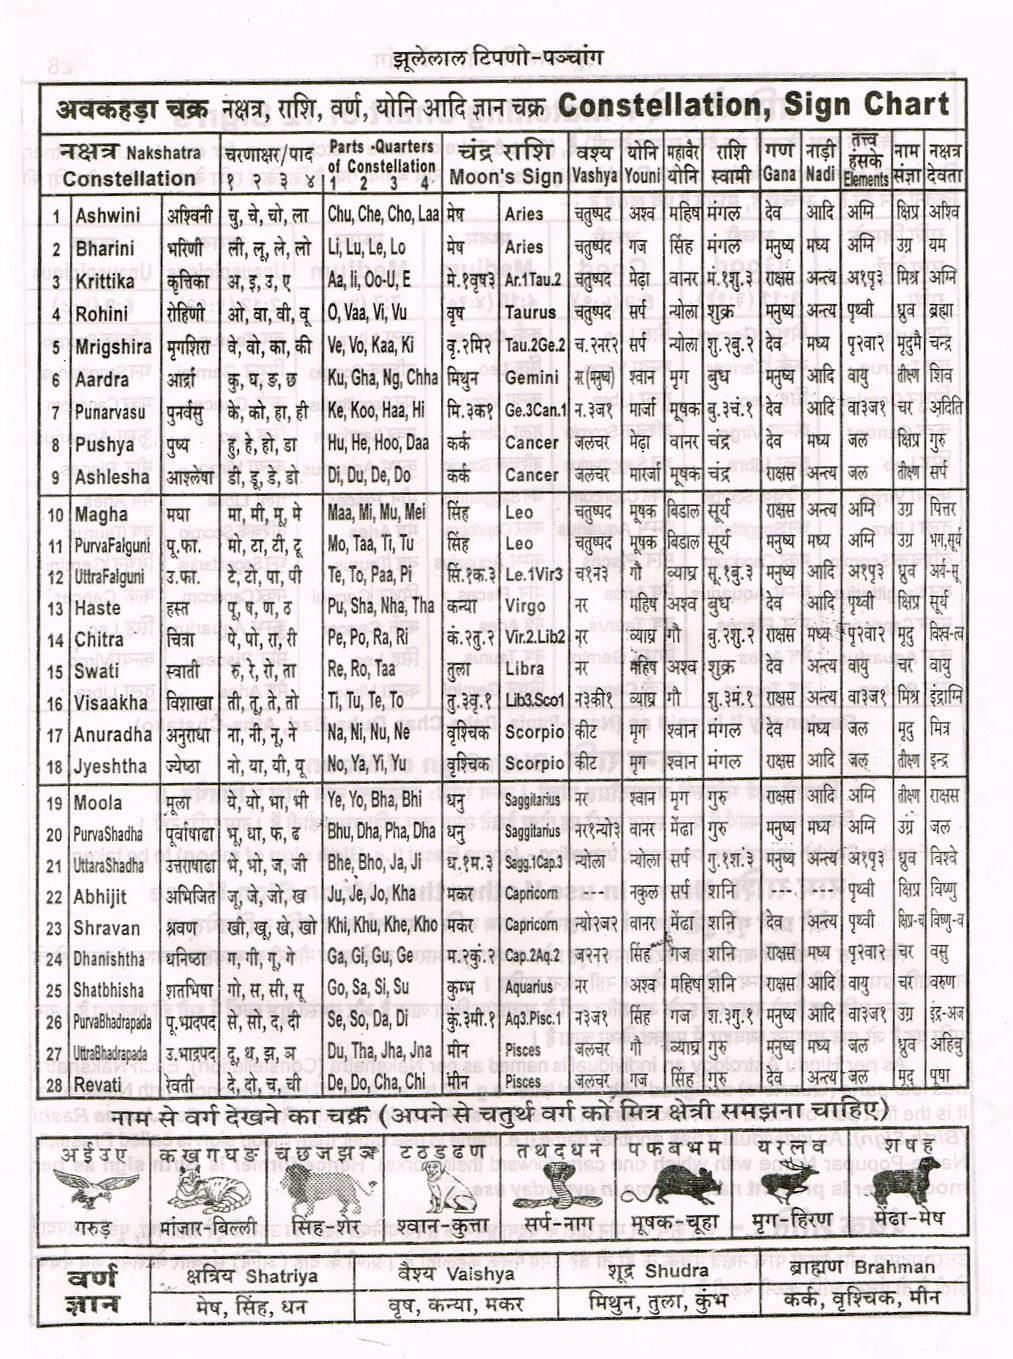 Astrological chart hindi hindi pinterest chart astrological chart hindi nvjuhfo Images